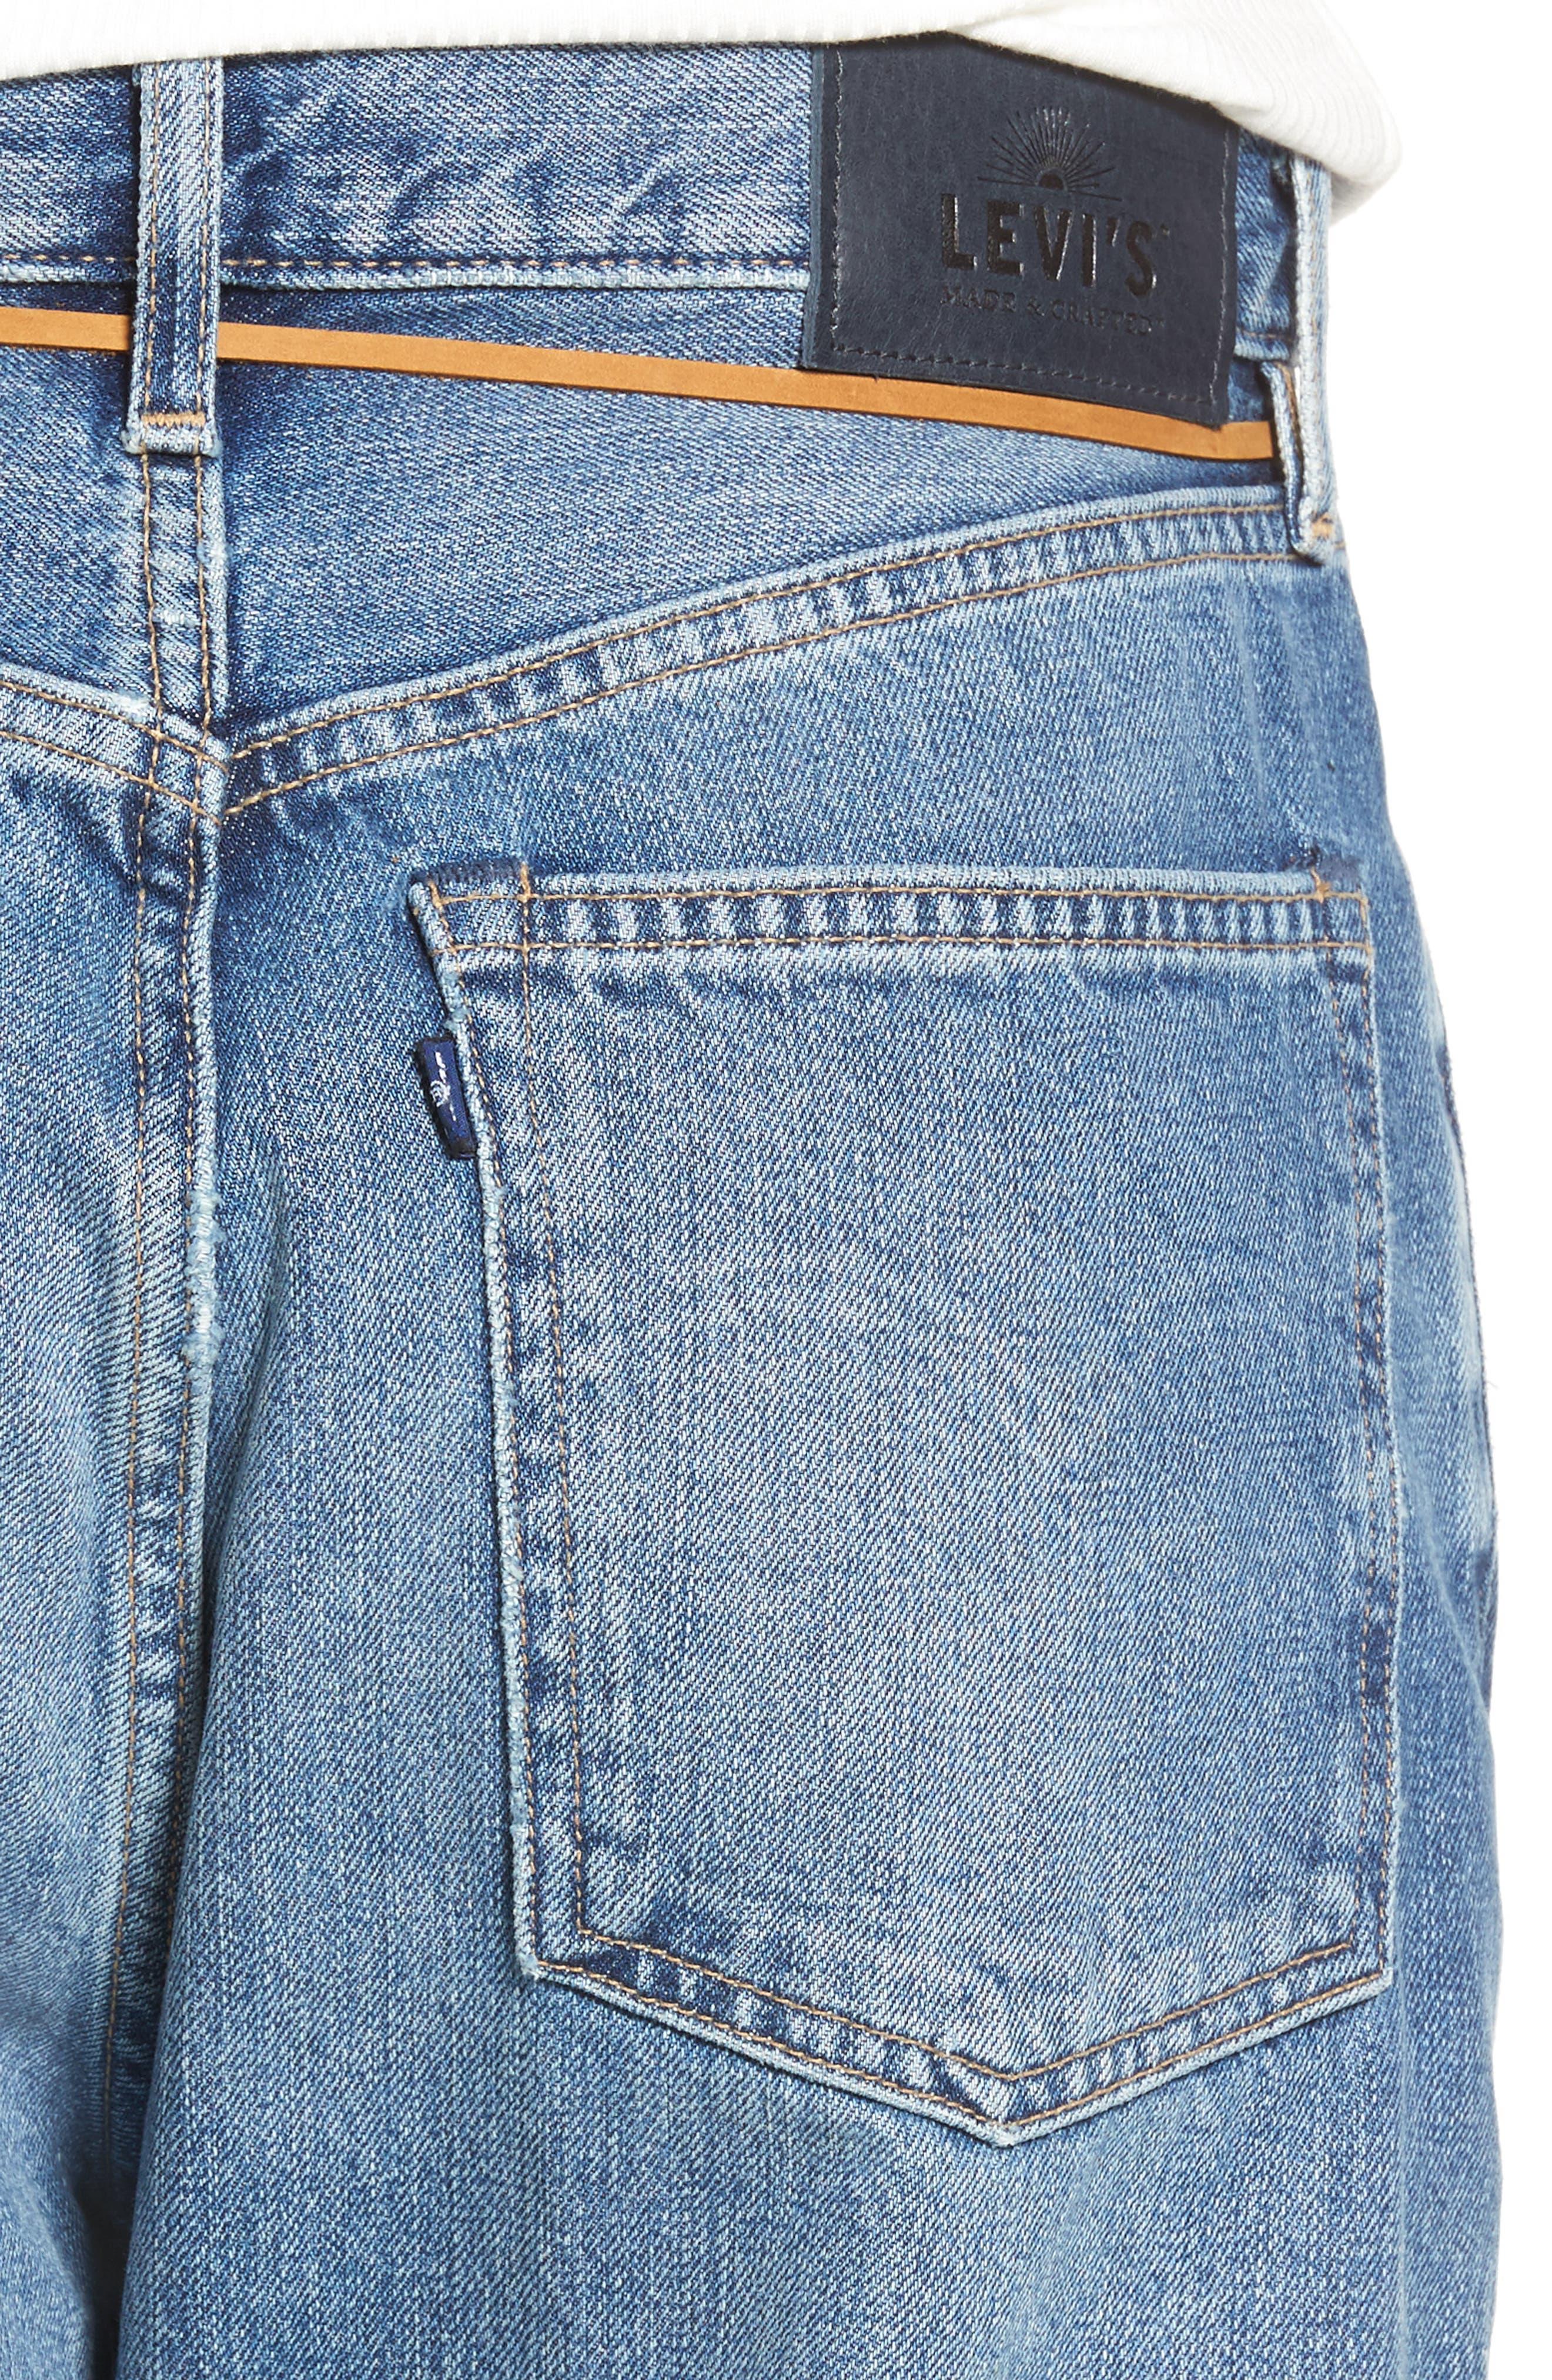 Barrel Jeans,                             Alternate thumbnail 4, color,                             420